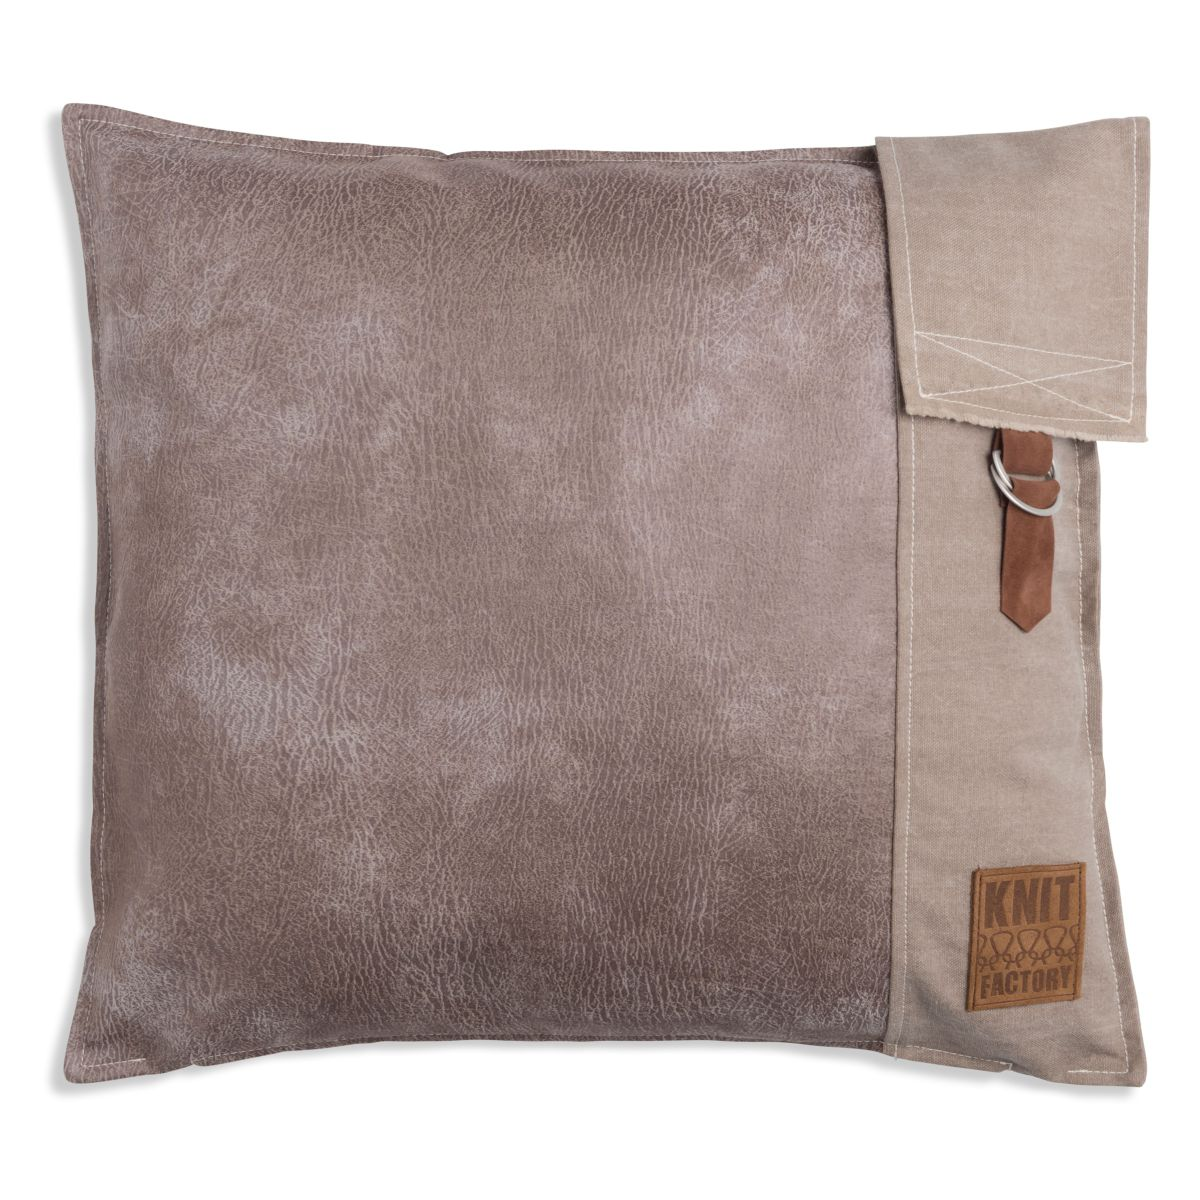 knit factory 1271212 kussen 50x50 luc beige 1